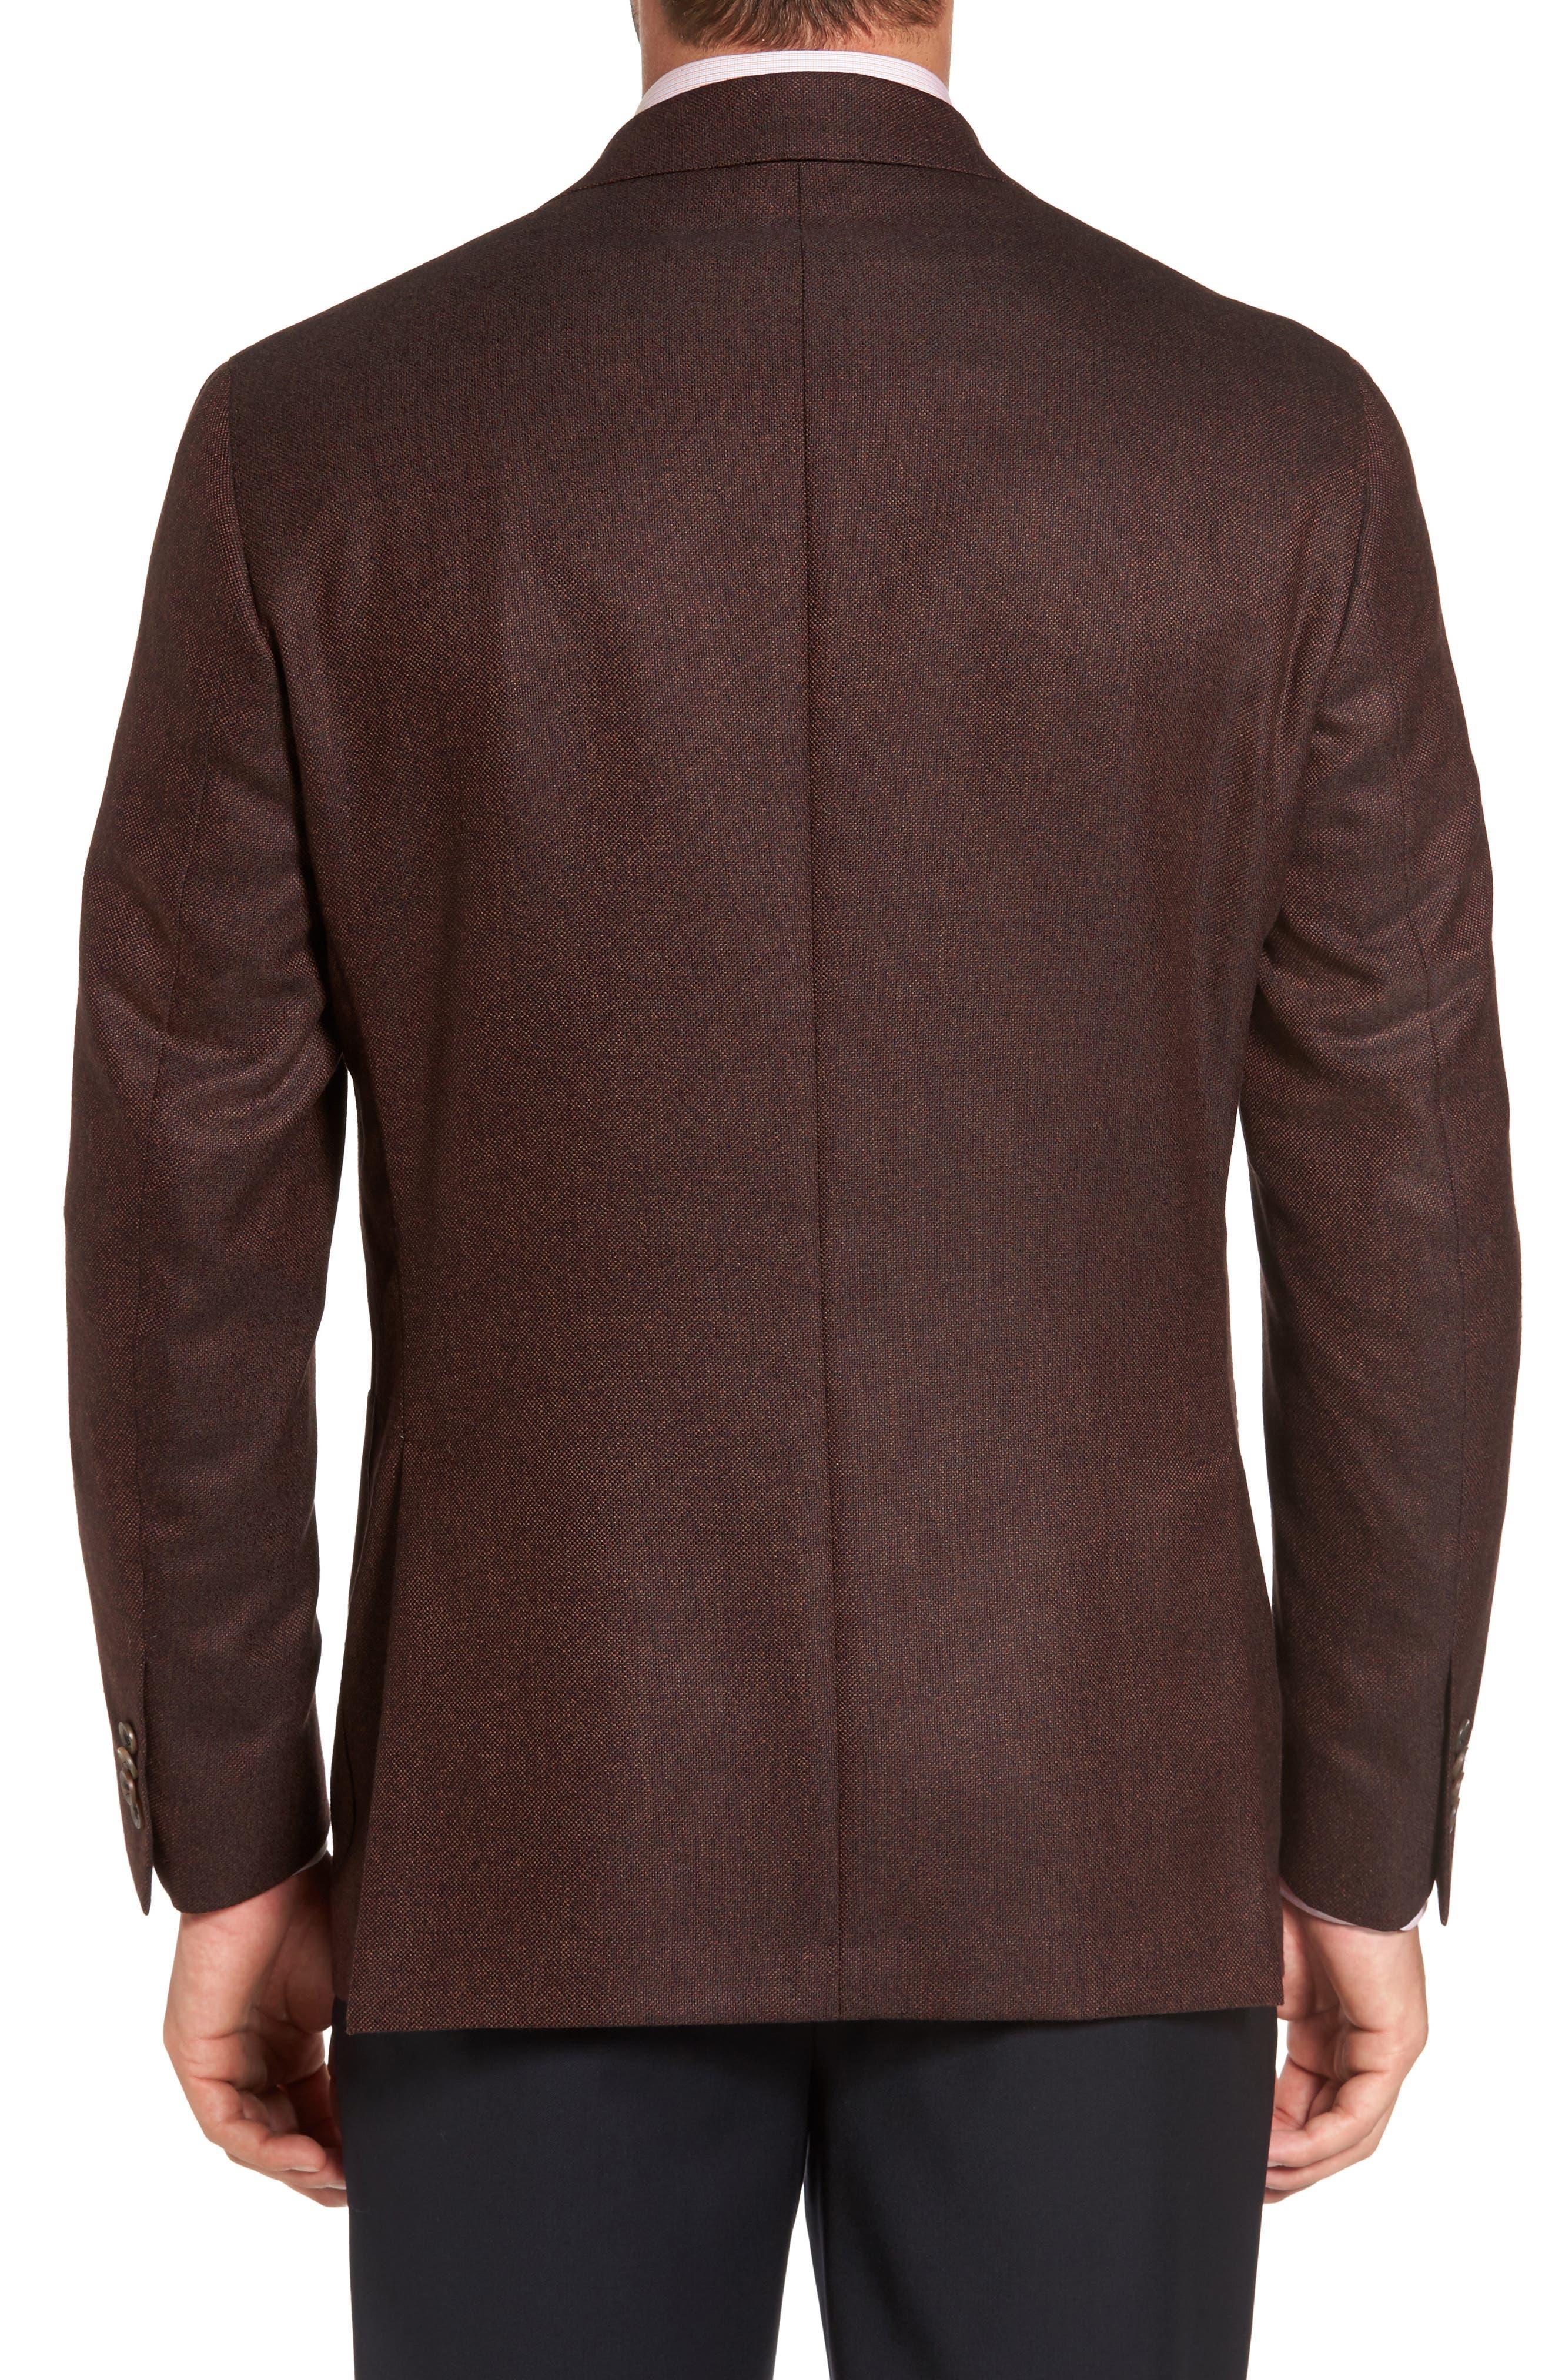 Aiden Classic Fit Wool Sport Coat,                             Alternate thumbnail 2, color,                             252